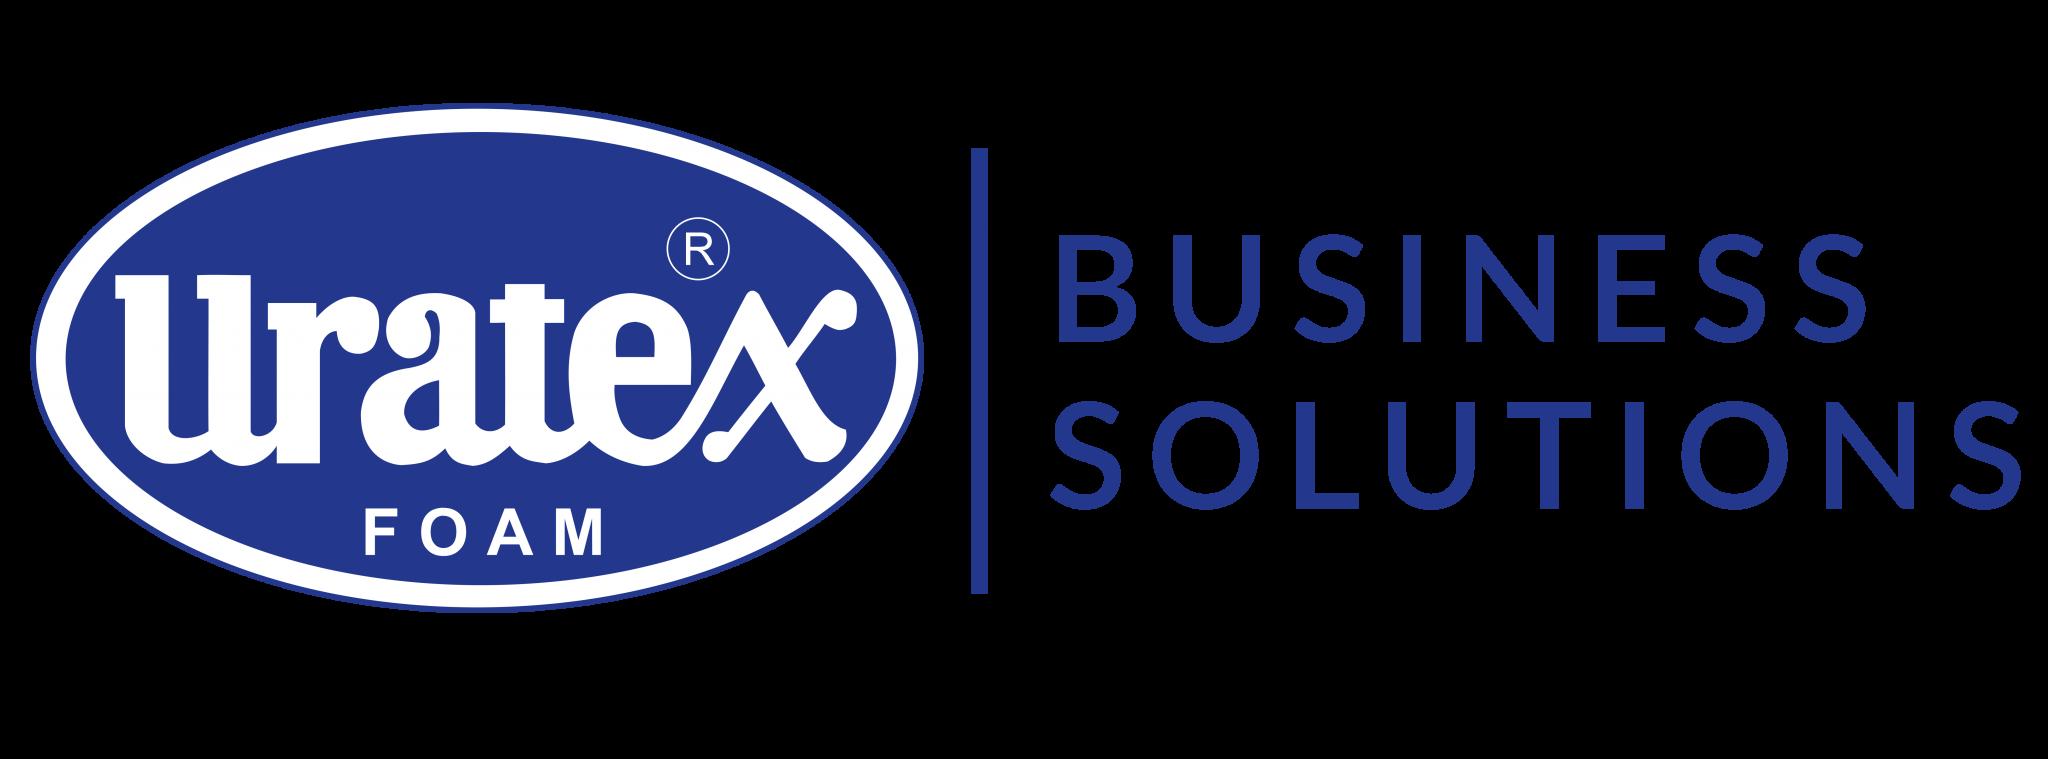 Uratex Uratex for Business